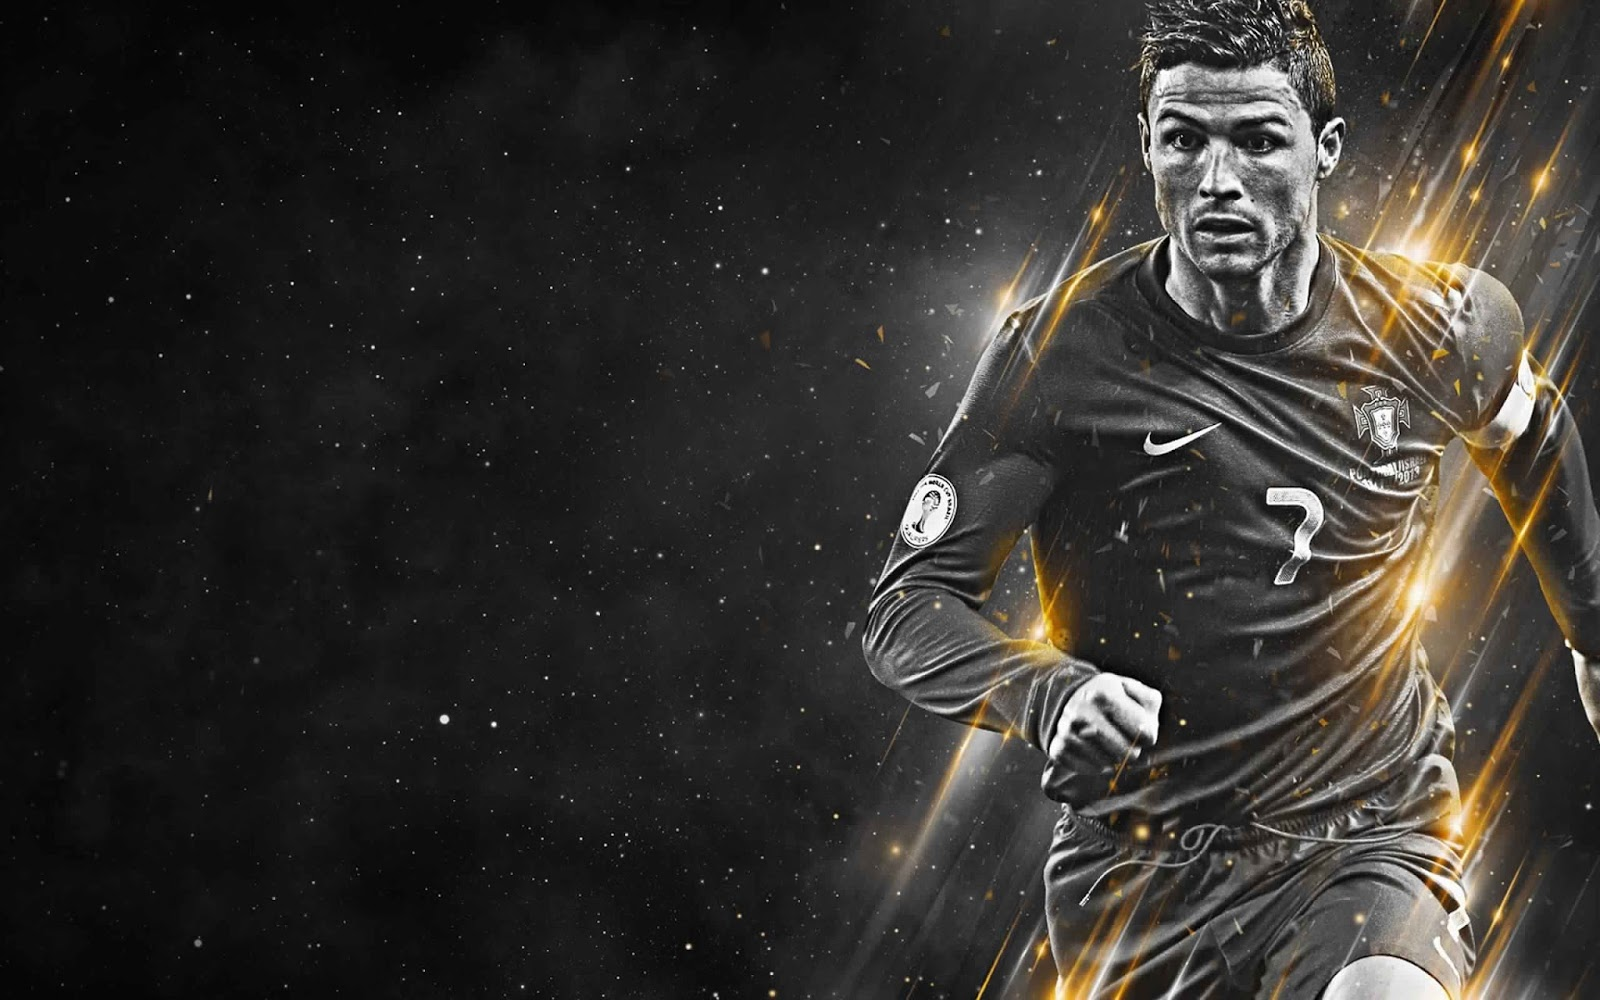 Free Download Cristiano Ronaldo Wallpapers Hd Real Madrid